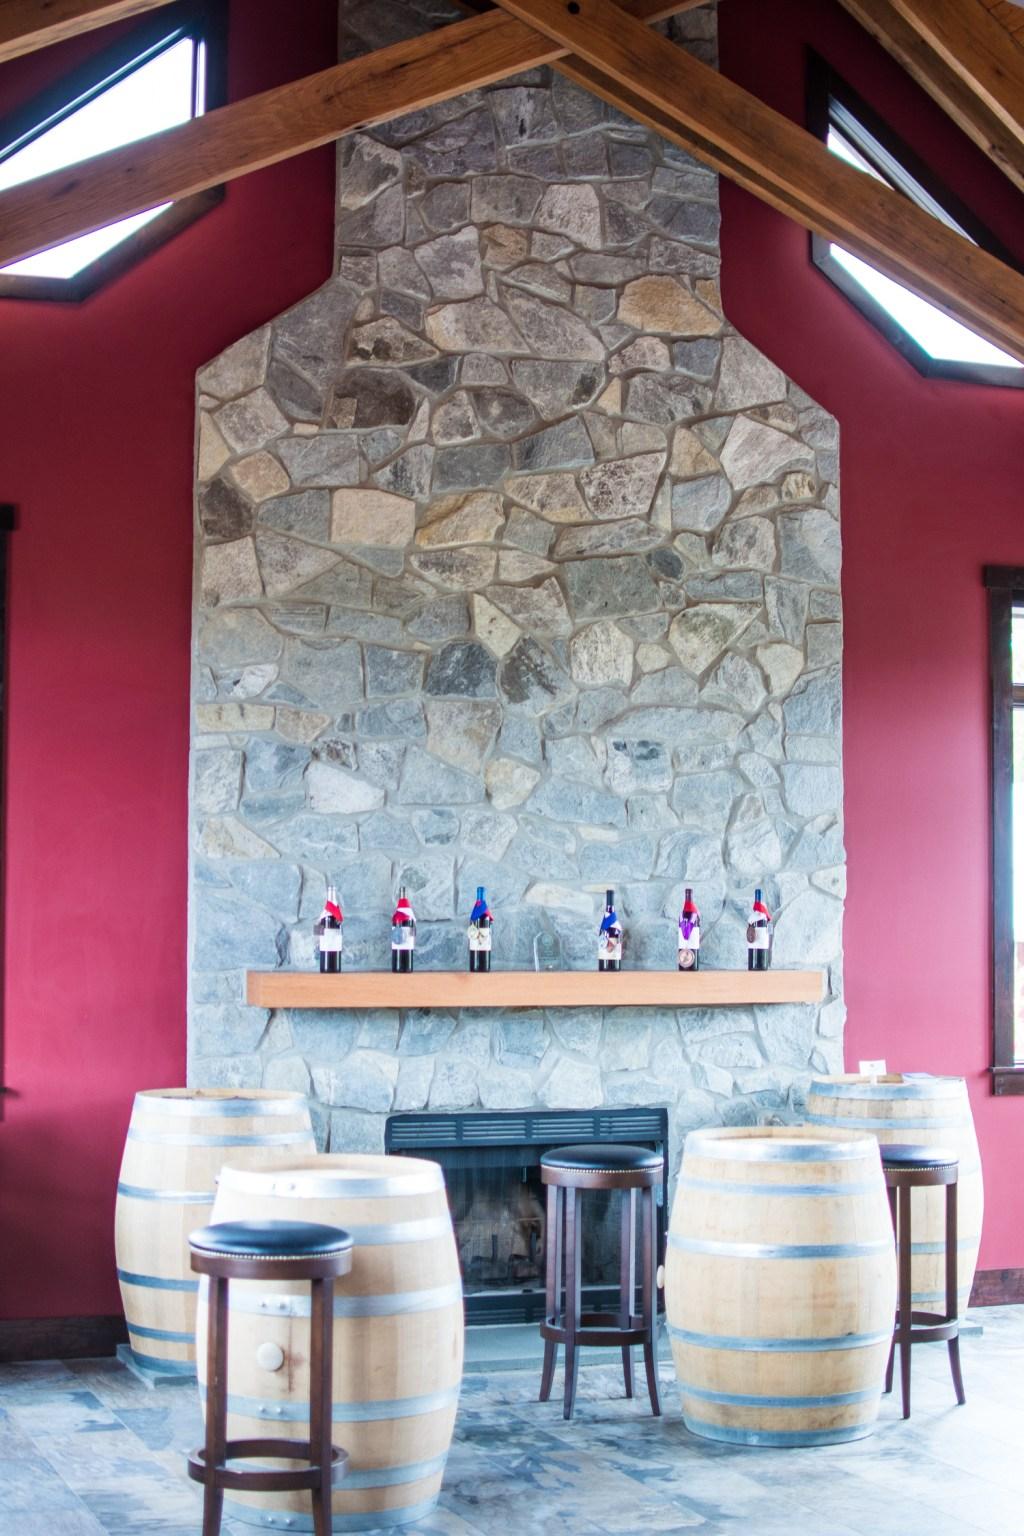 Stunning Views & Award Winning Wines at Catoctin Breeze Vineyard - Maryland Travel - @lacegraceblog1